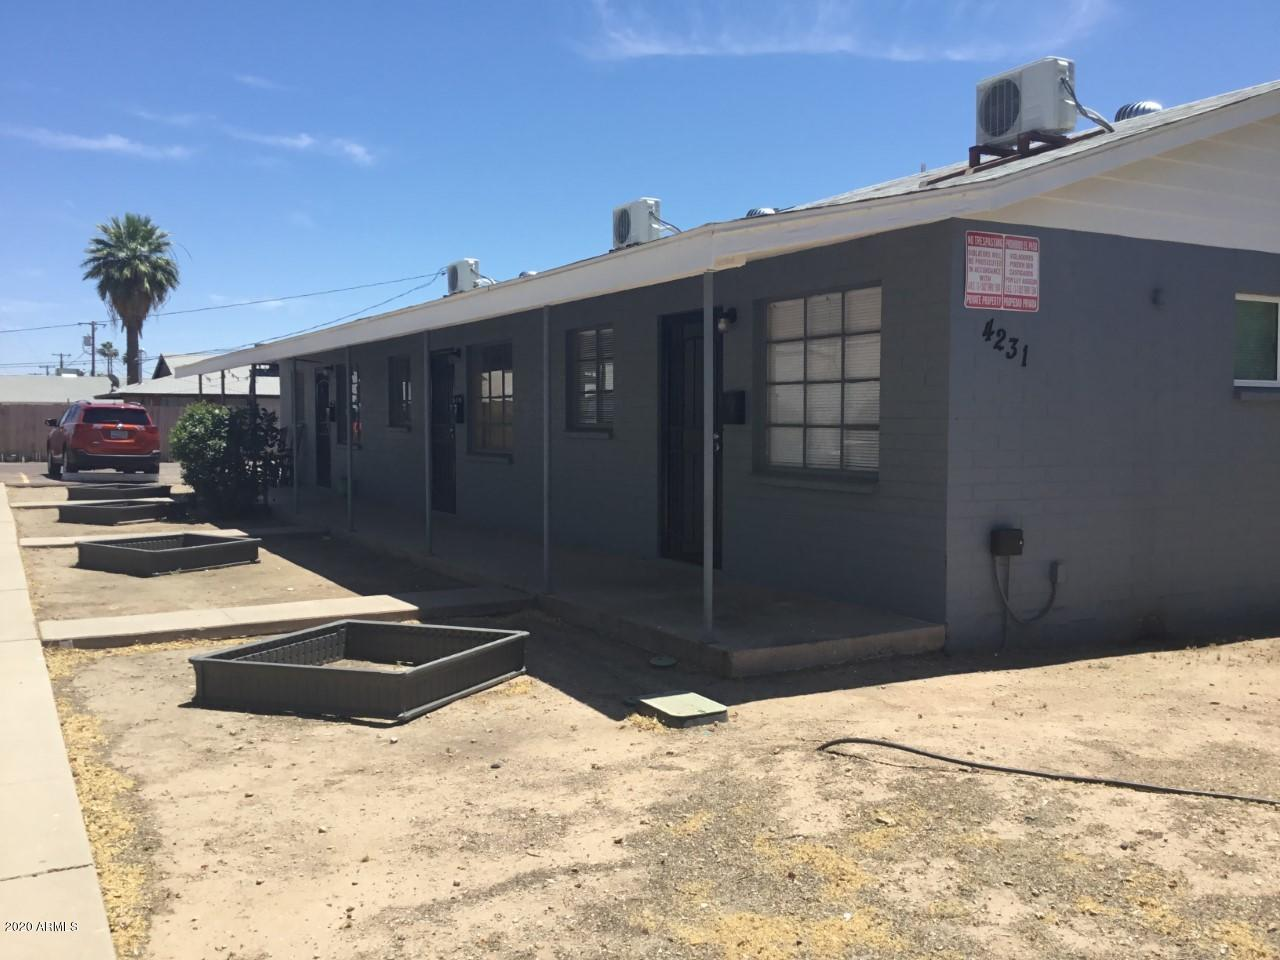 MLS 6080411 Phoenix Metro Area, Phoenix, AZ 85015 Affordable Homes in Phoenix